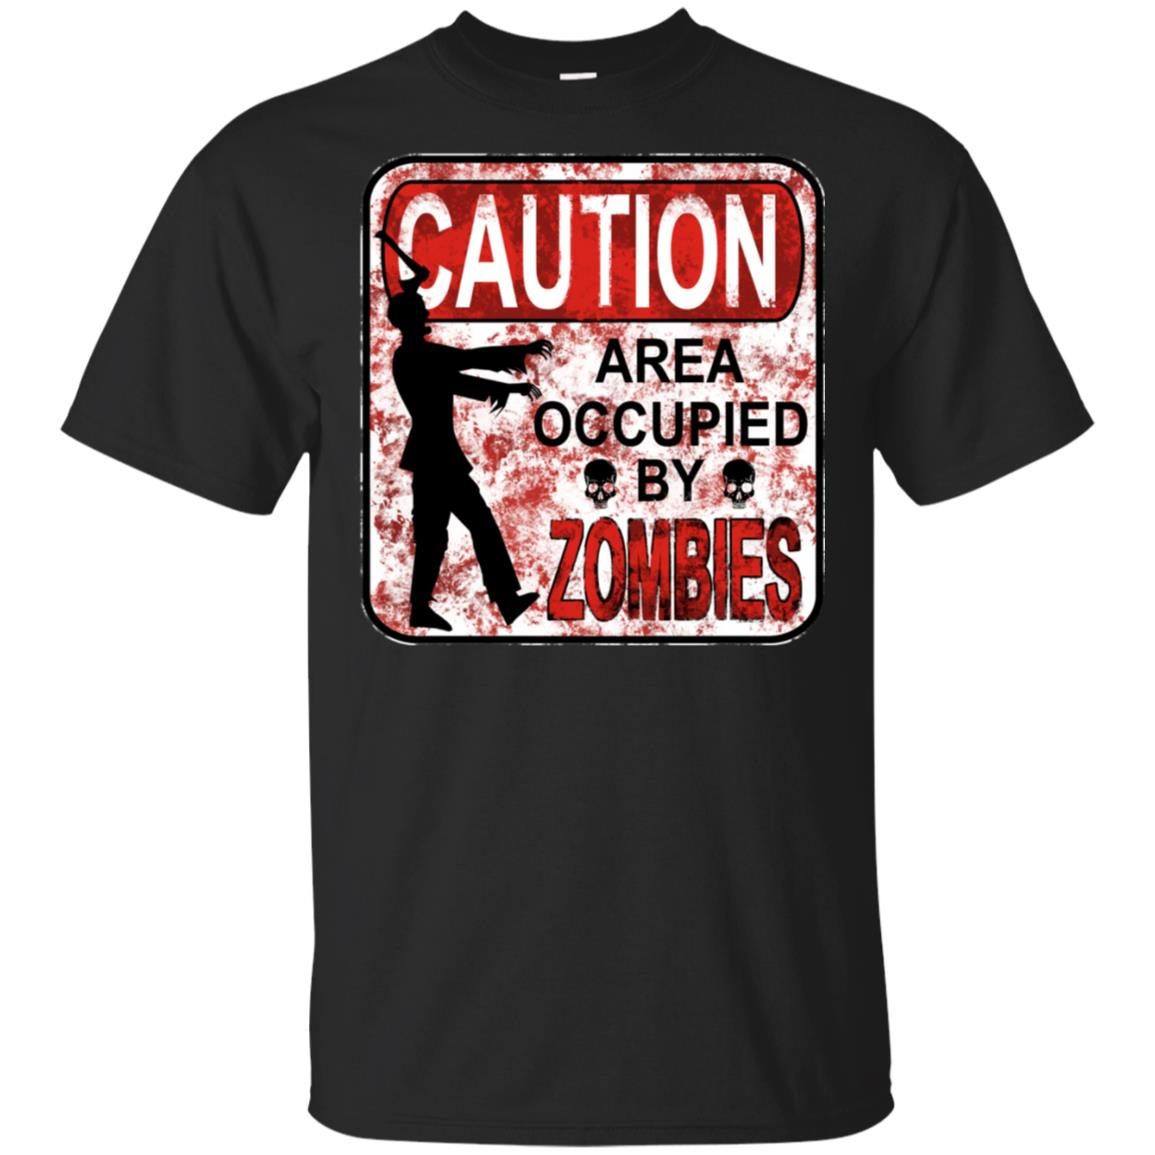 Funny Zombie Apocalypse Caution Zone Sign Unisex Short Sleeve